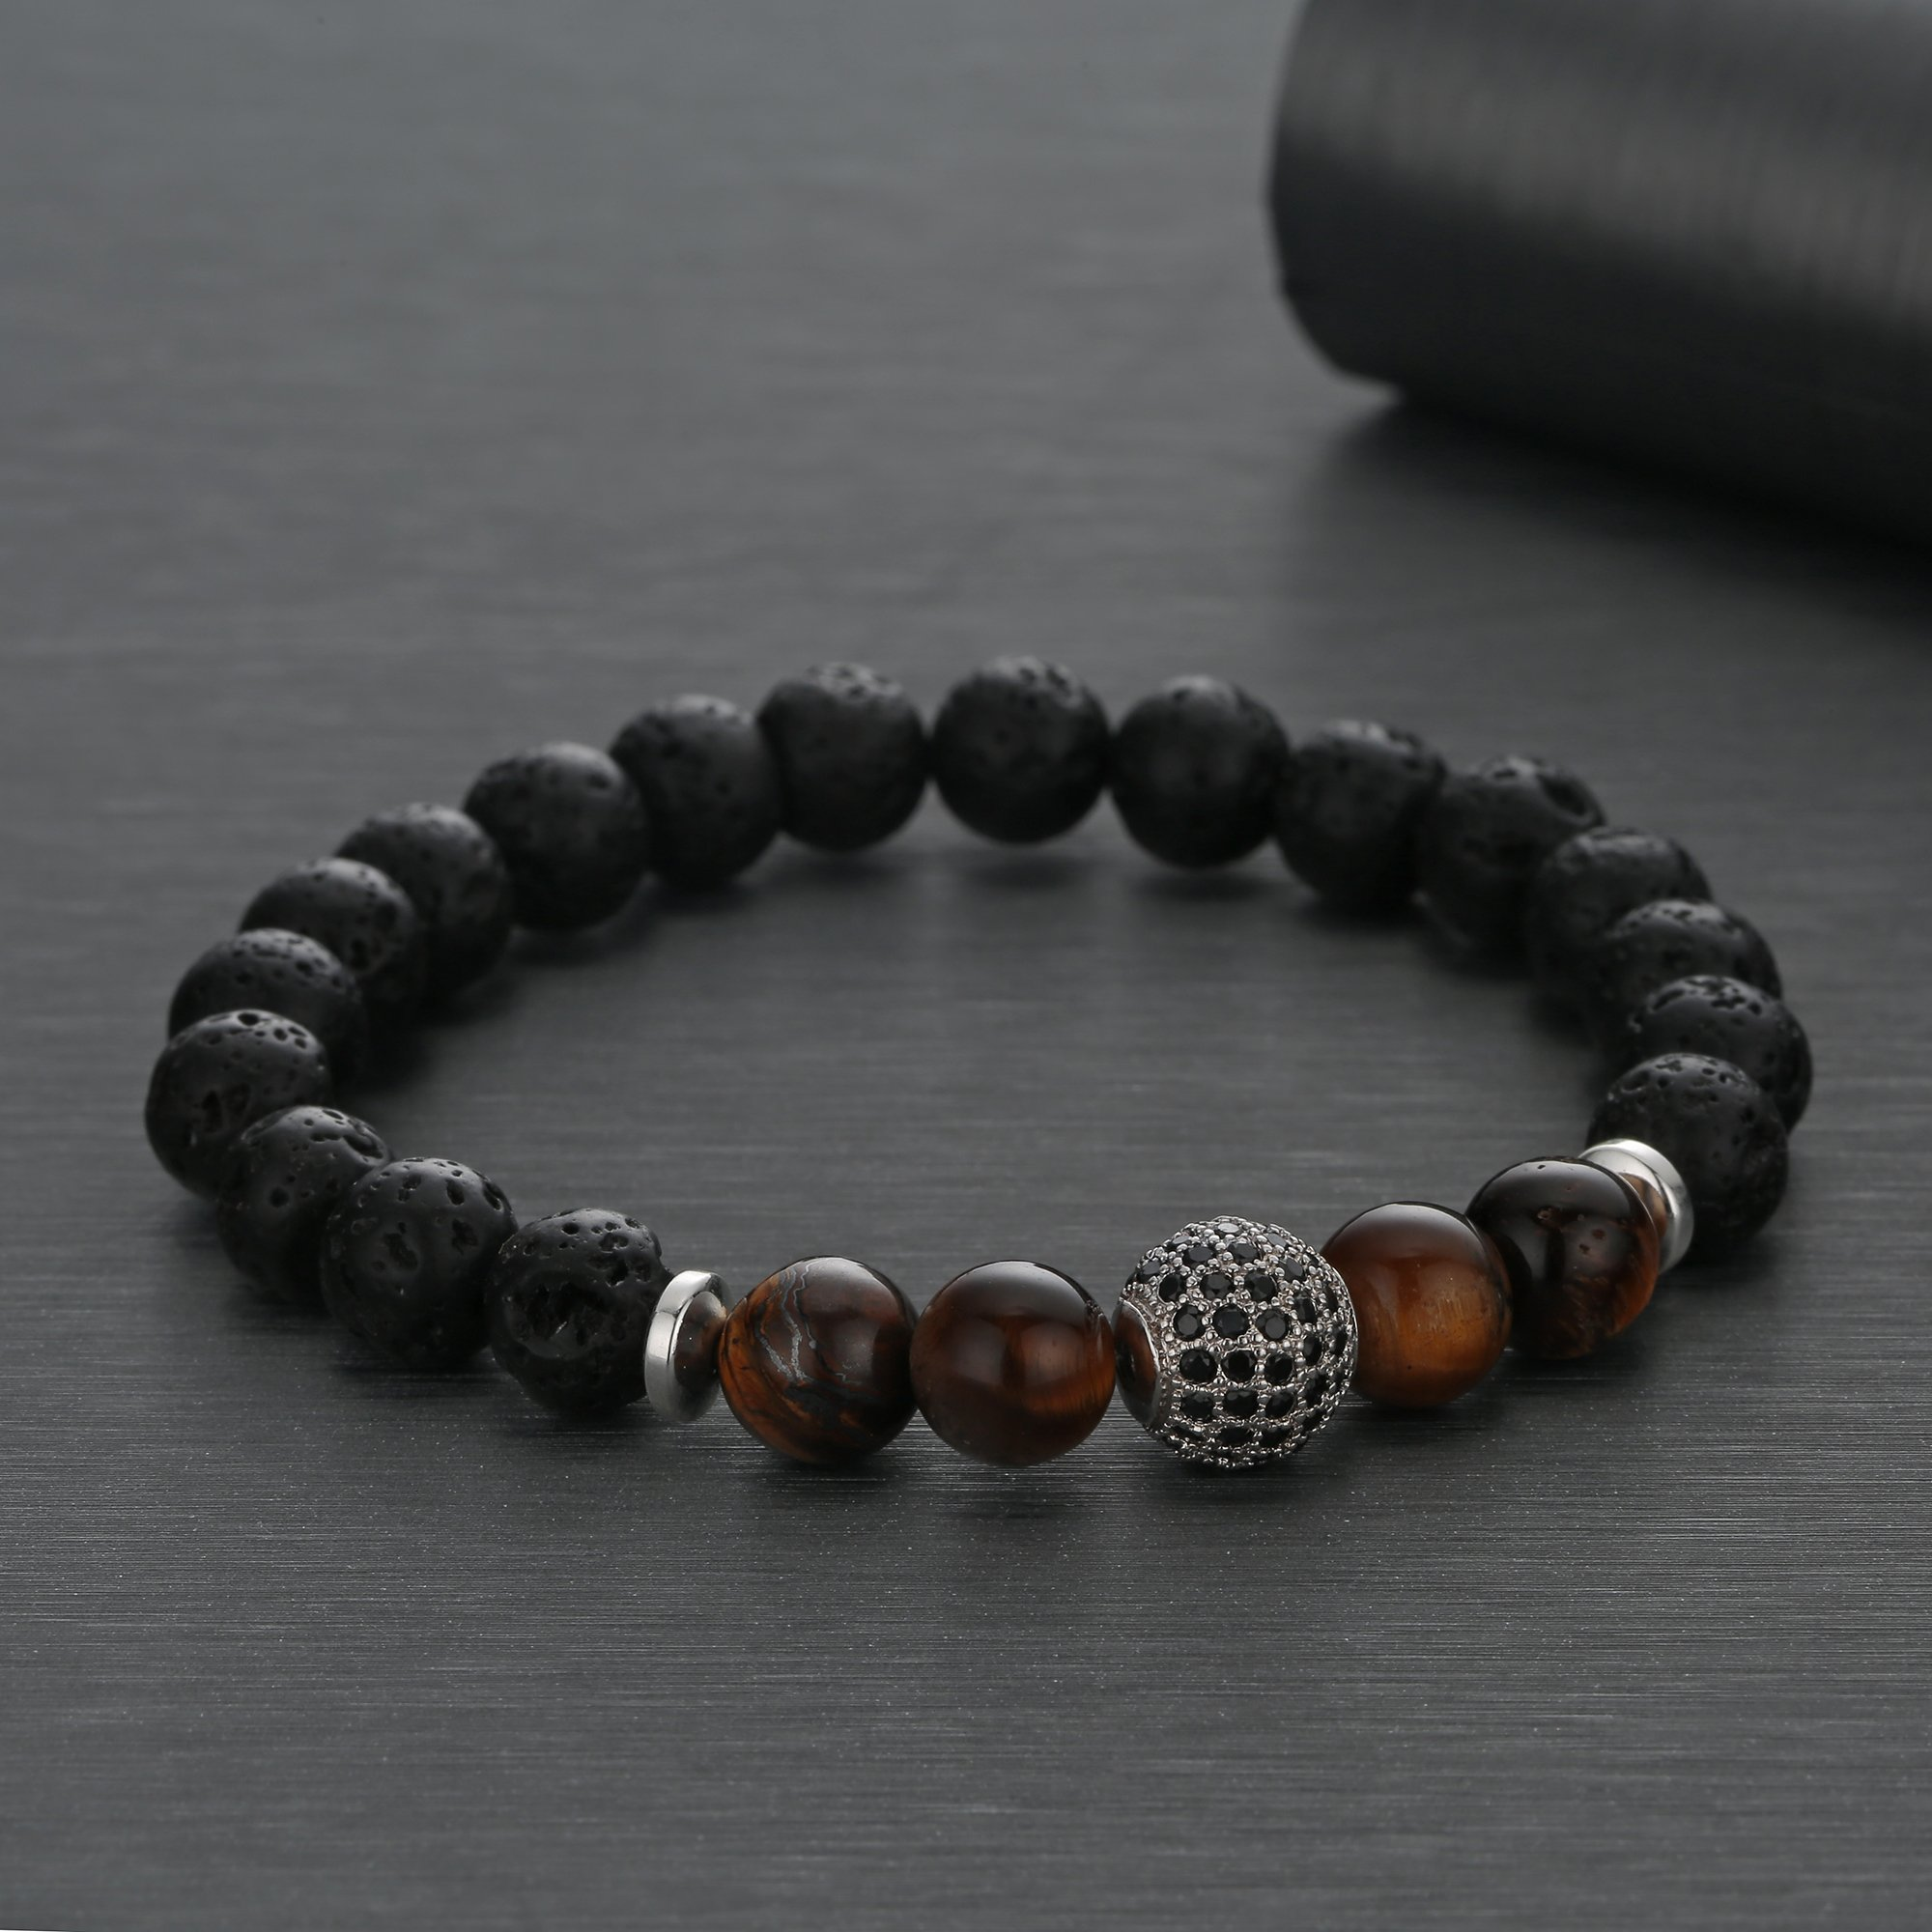 Joya Gift Lava Rock Stone Essential Oil Diffuser Yoga Bracelet with Silver CZ Ball for Women Men